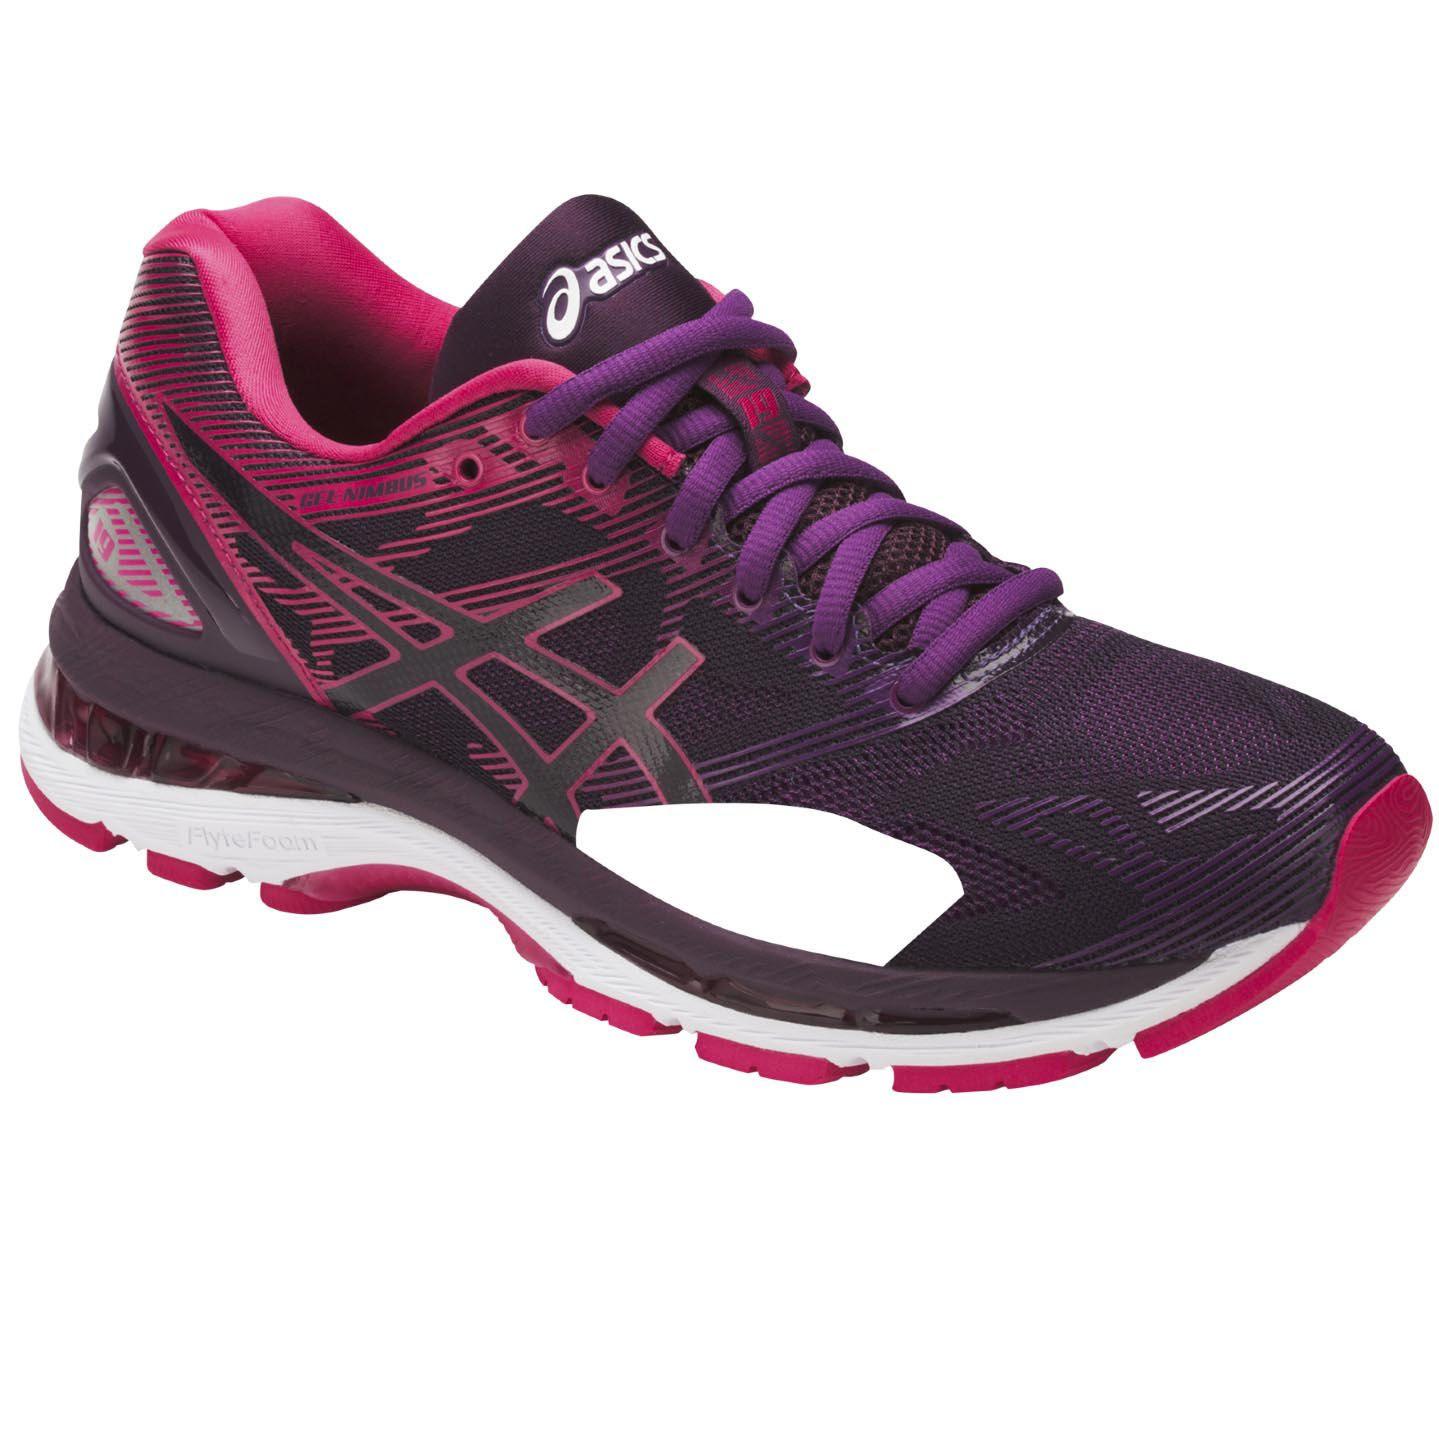 New Asics Nimbus Womens Running Shoes Size